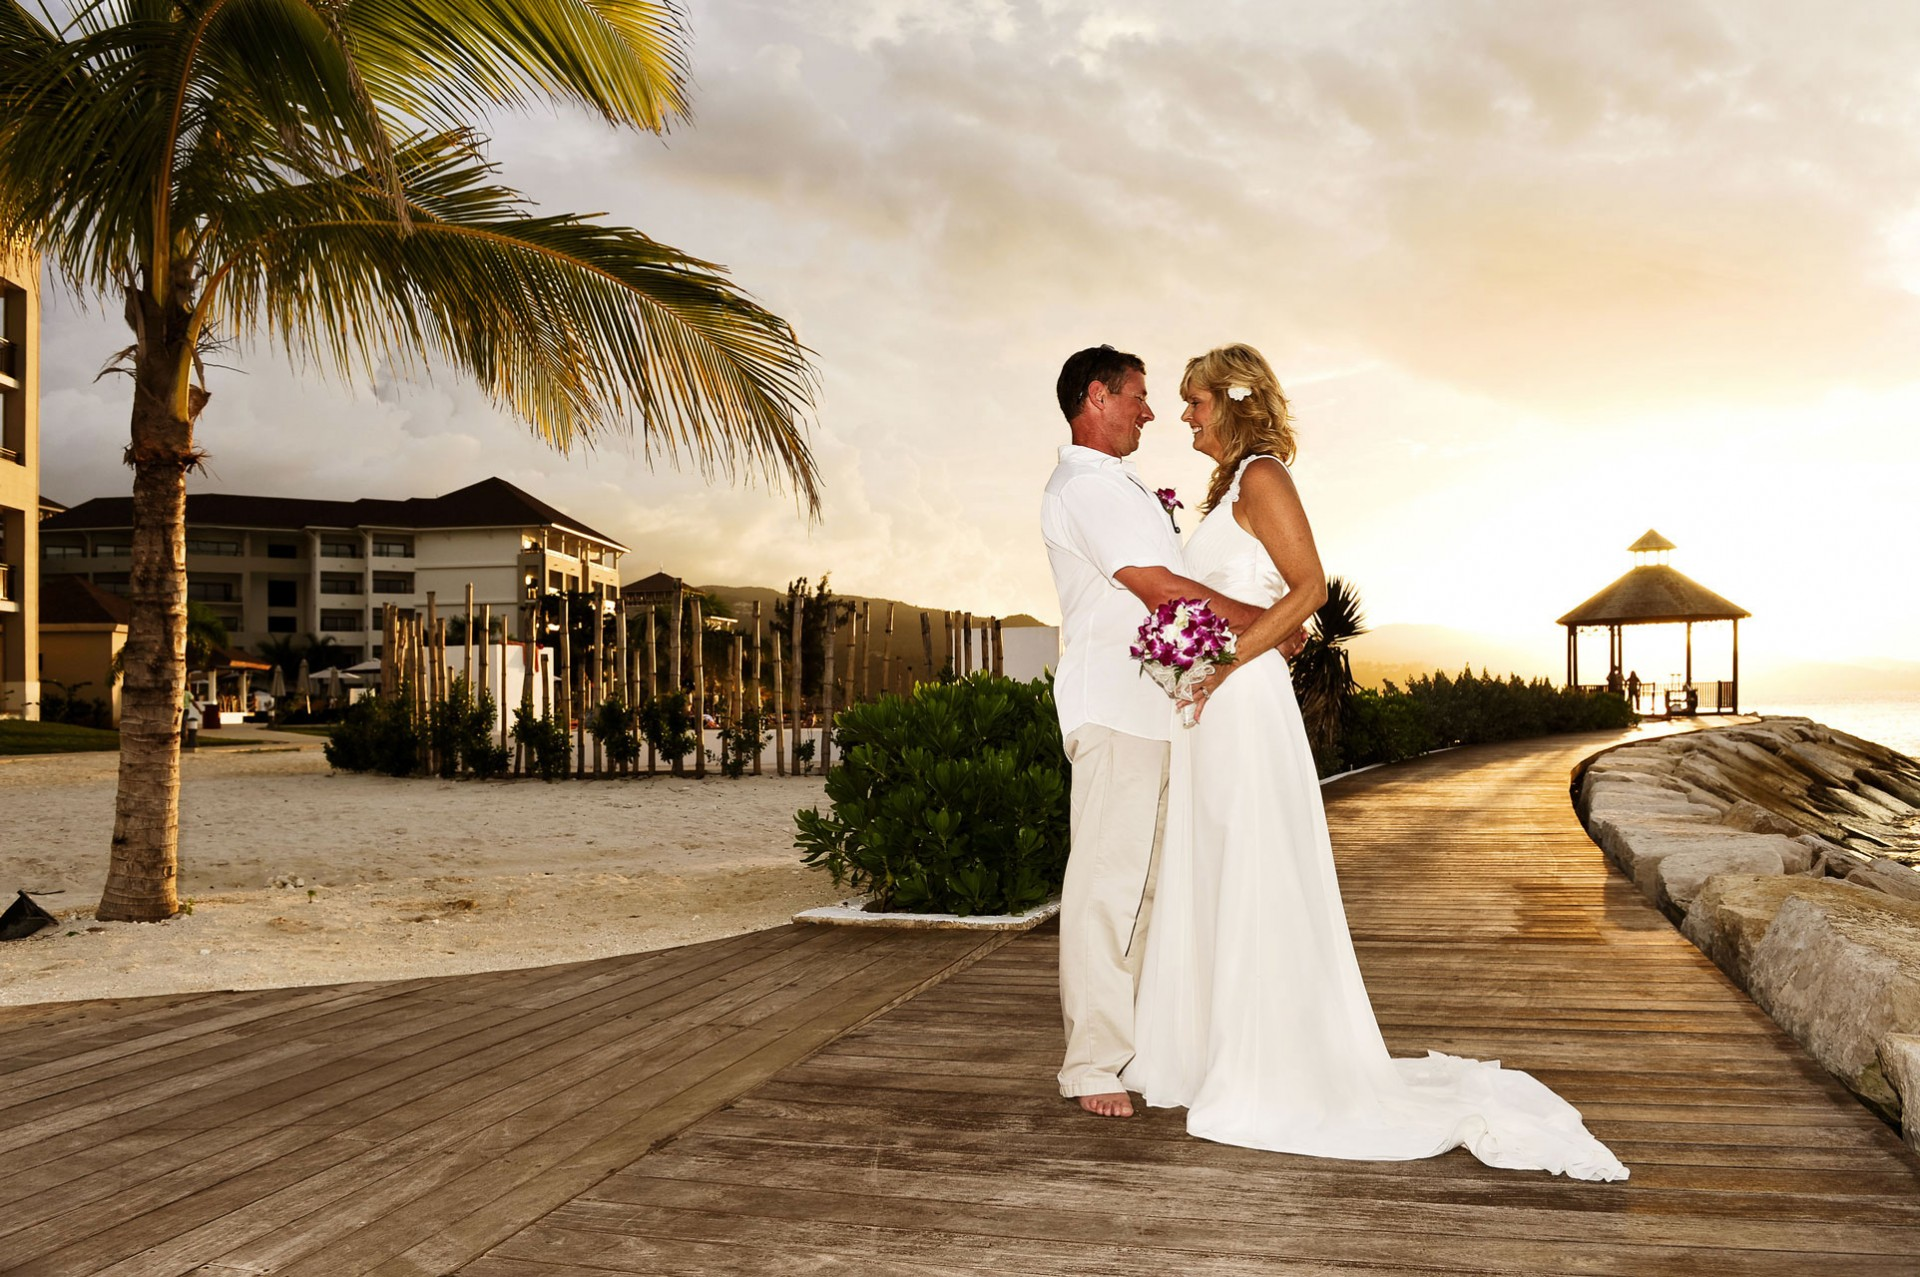 Scott and Raneta's Wedding Photos